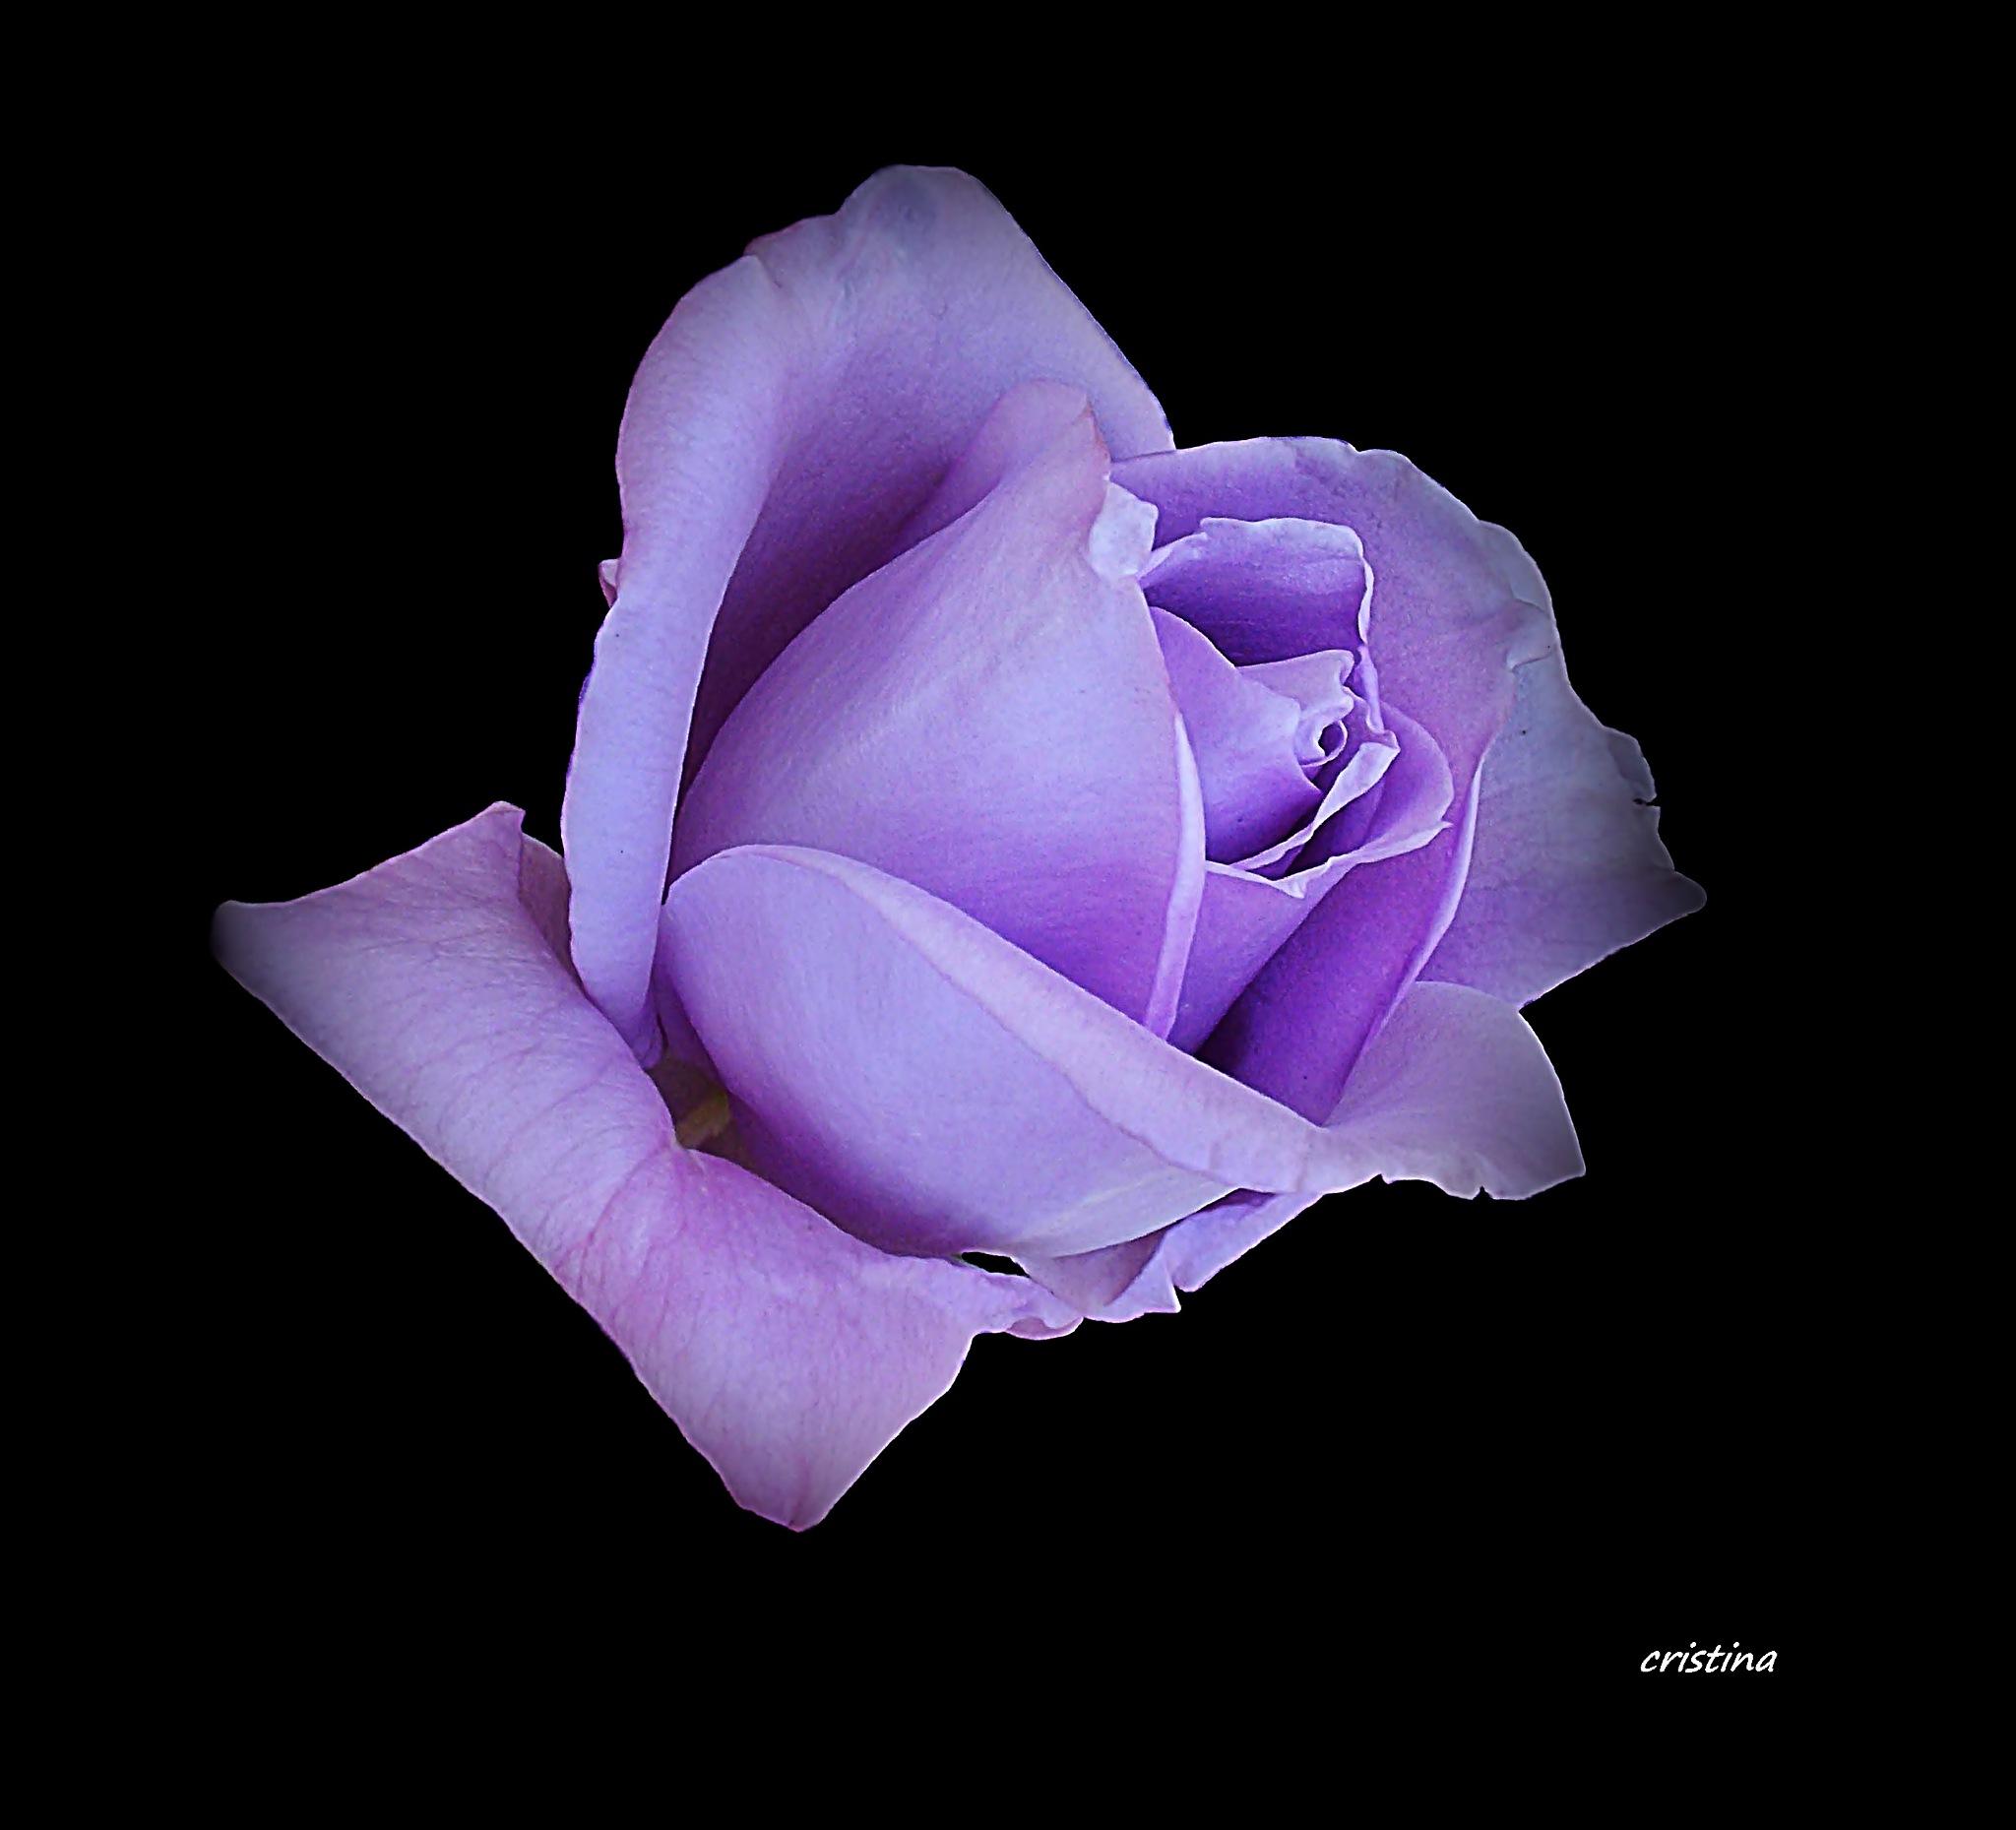 púrpura by Cristina Angélica